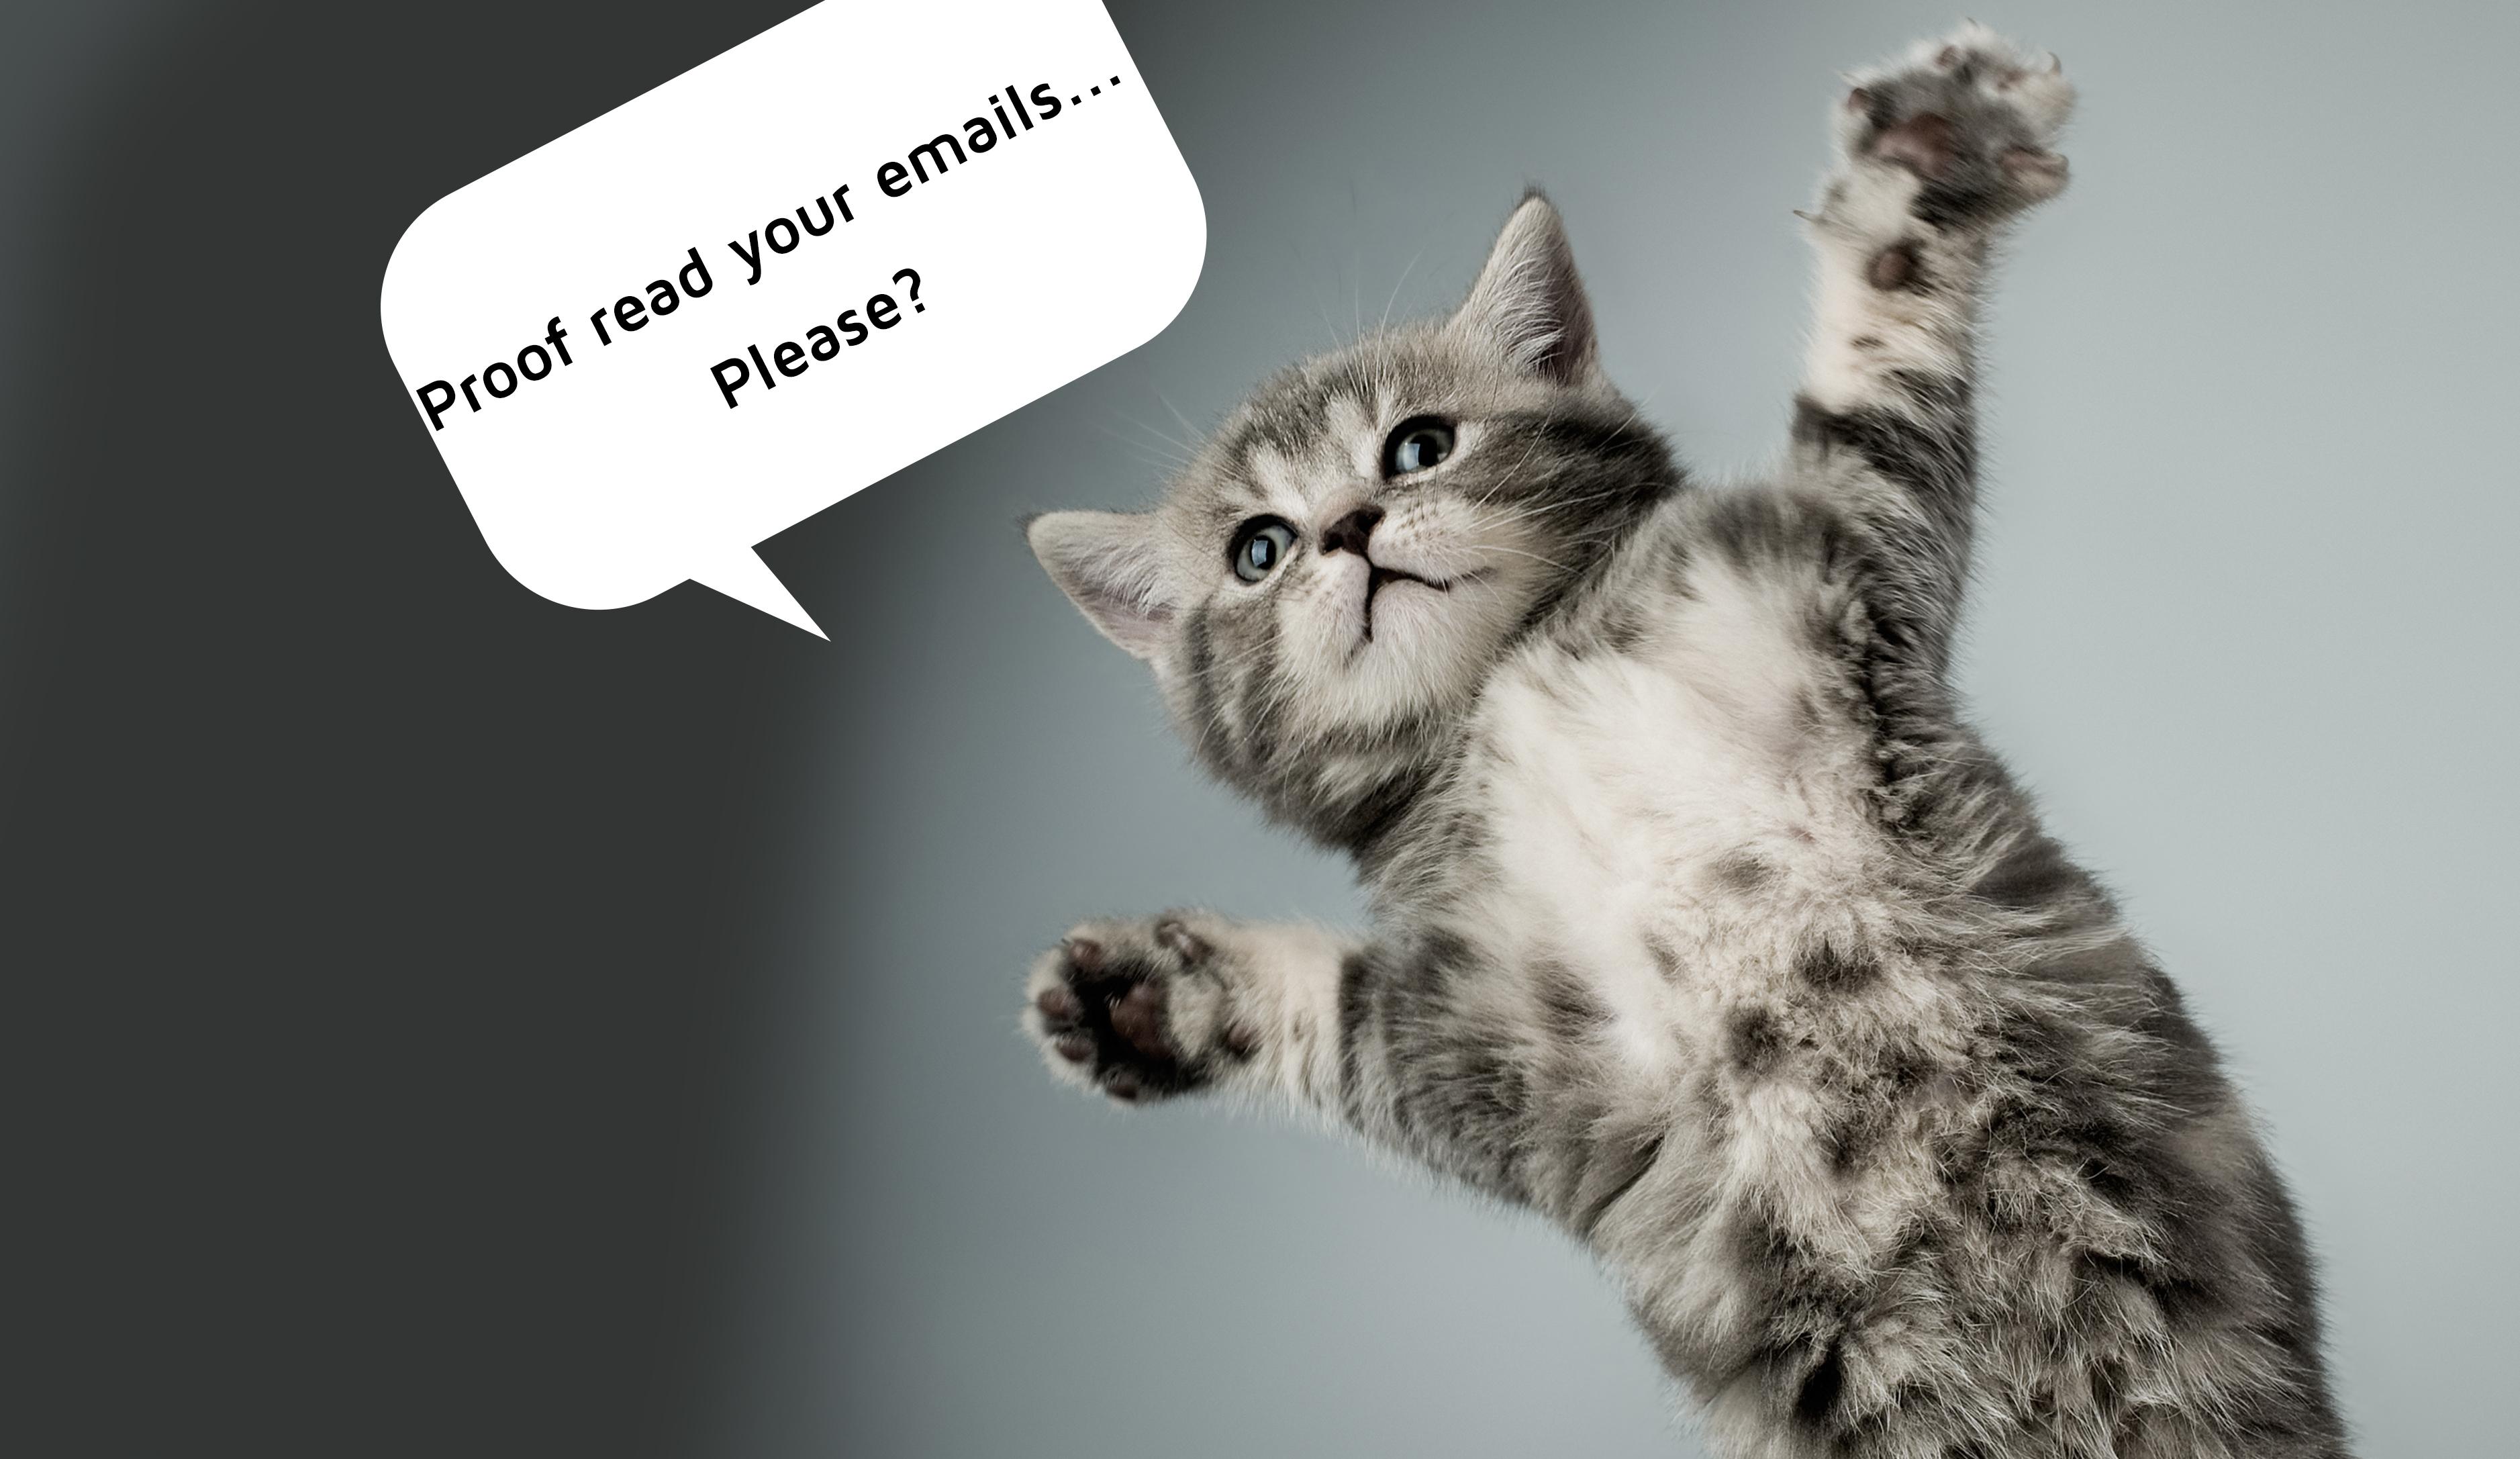 KittyEmails